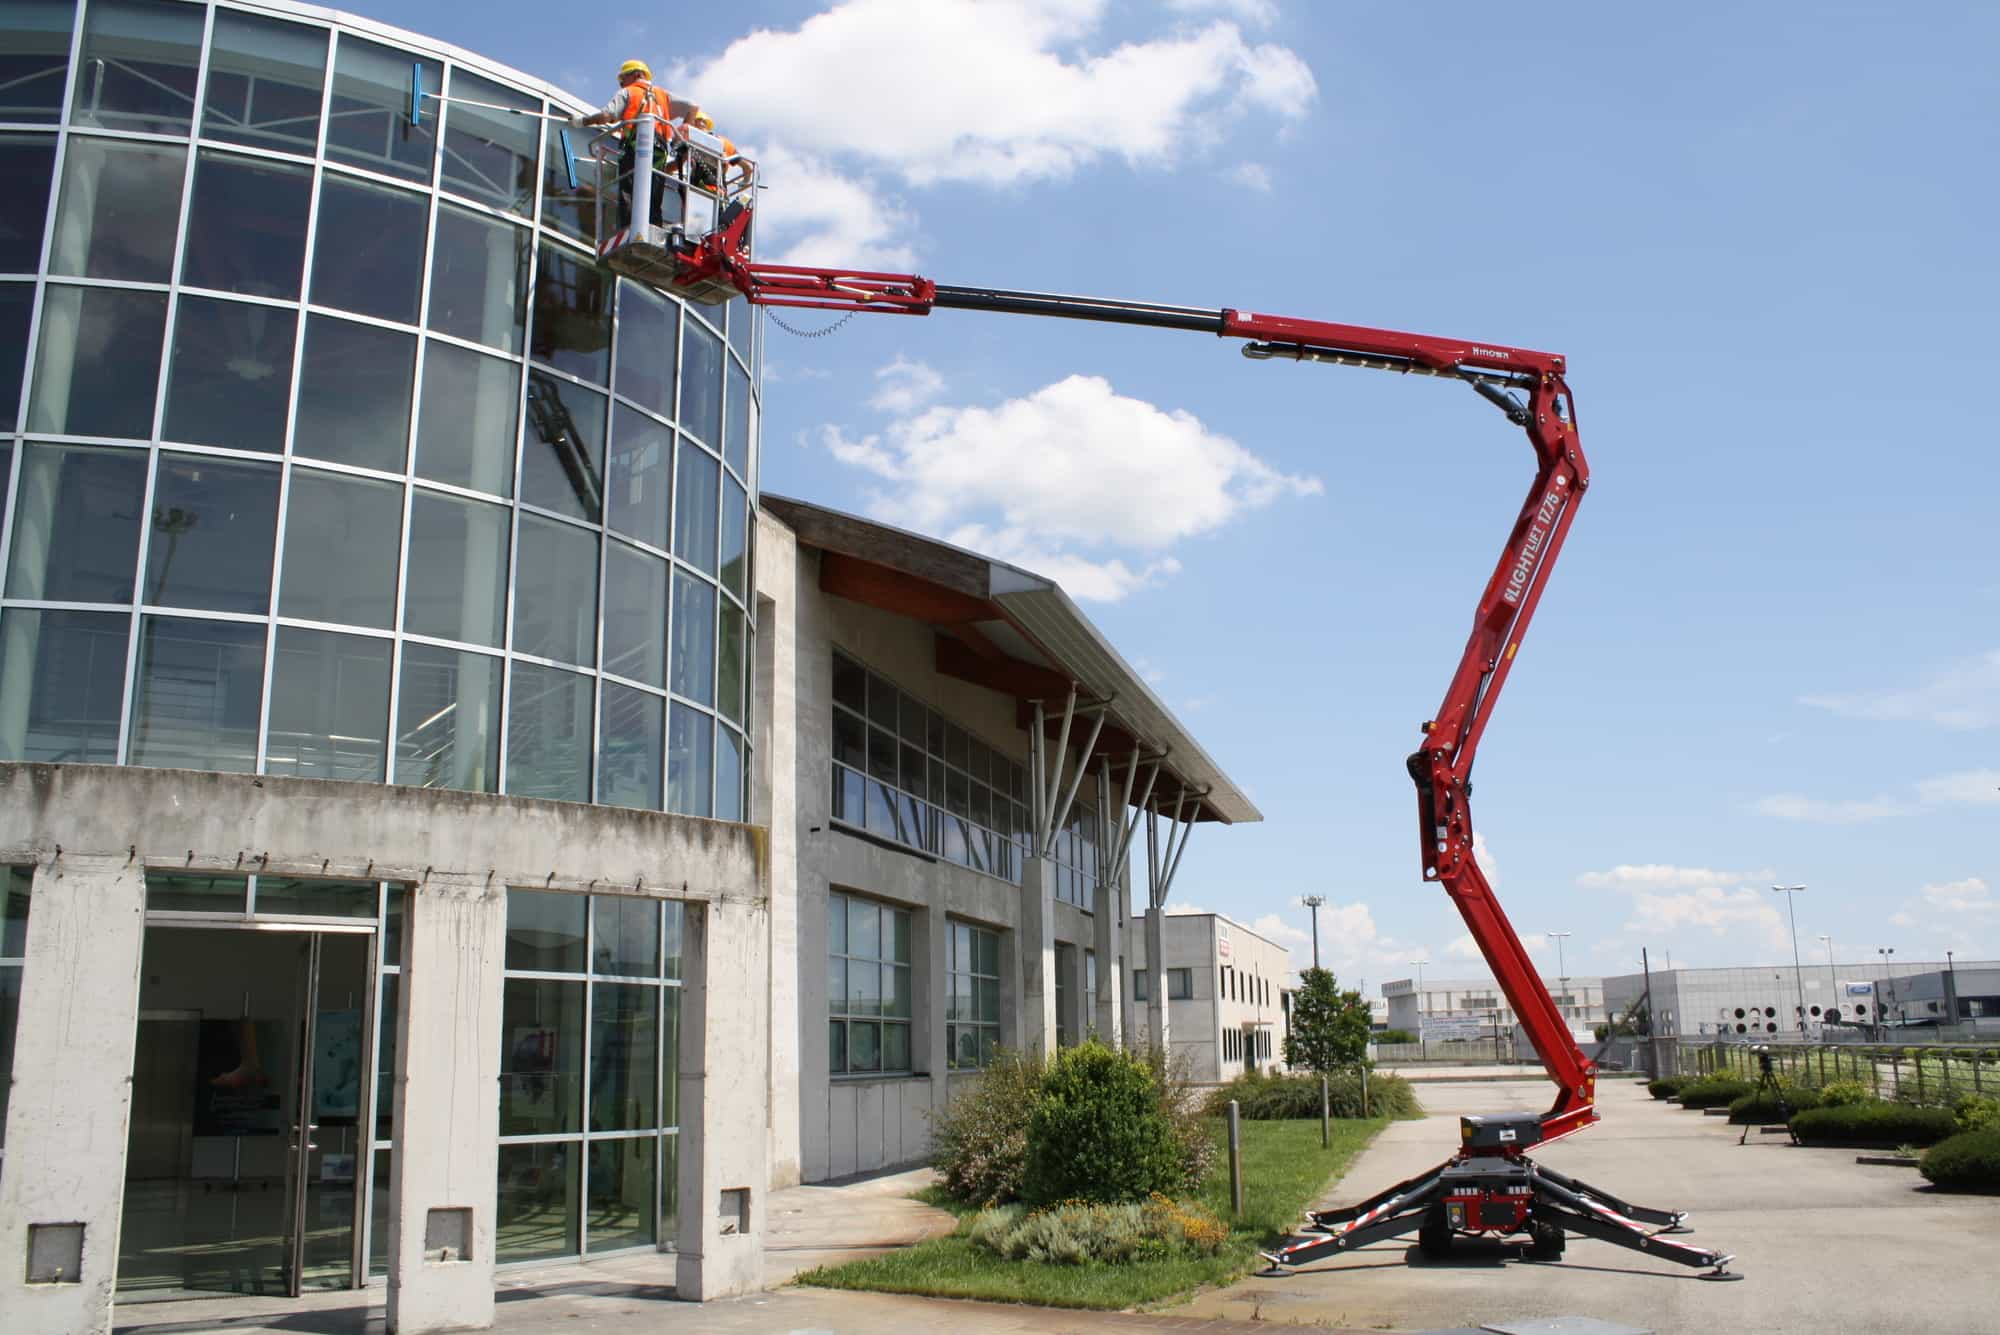 Spider Lift Rentals - Hinowa Light Lift 17.75 IIIS Performance